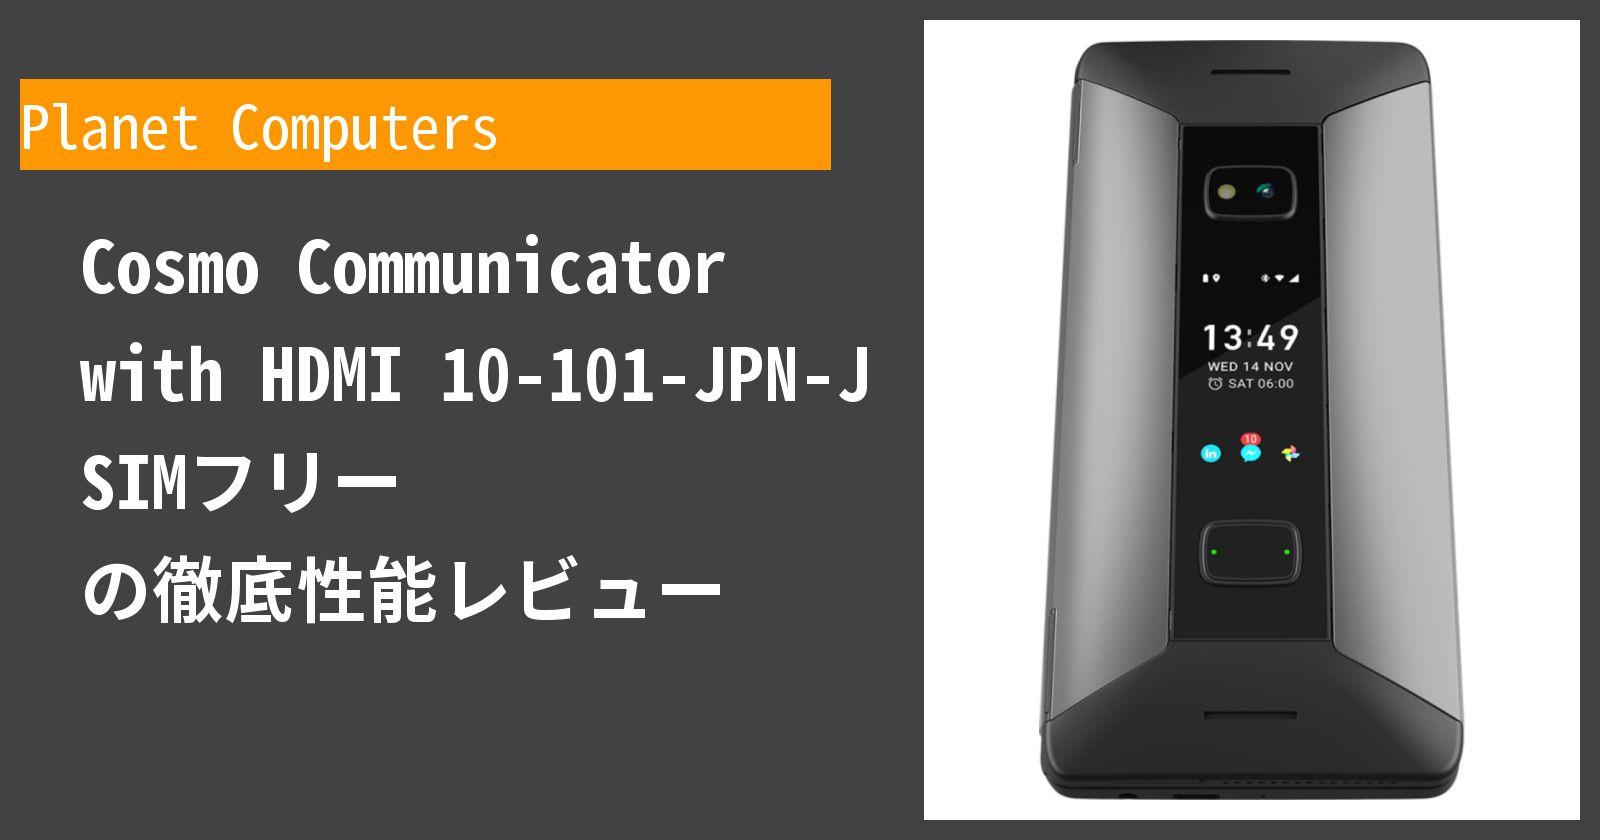 Cosmo Communicator with HDMI 10-101-JPN-J SIMフリー の徹底性能レビュー